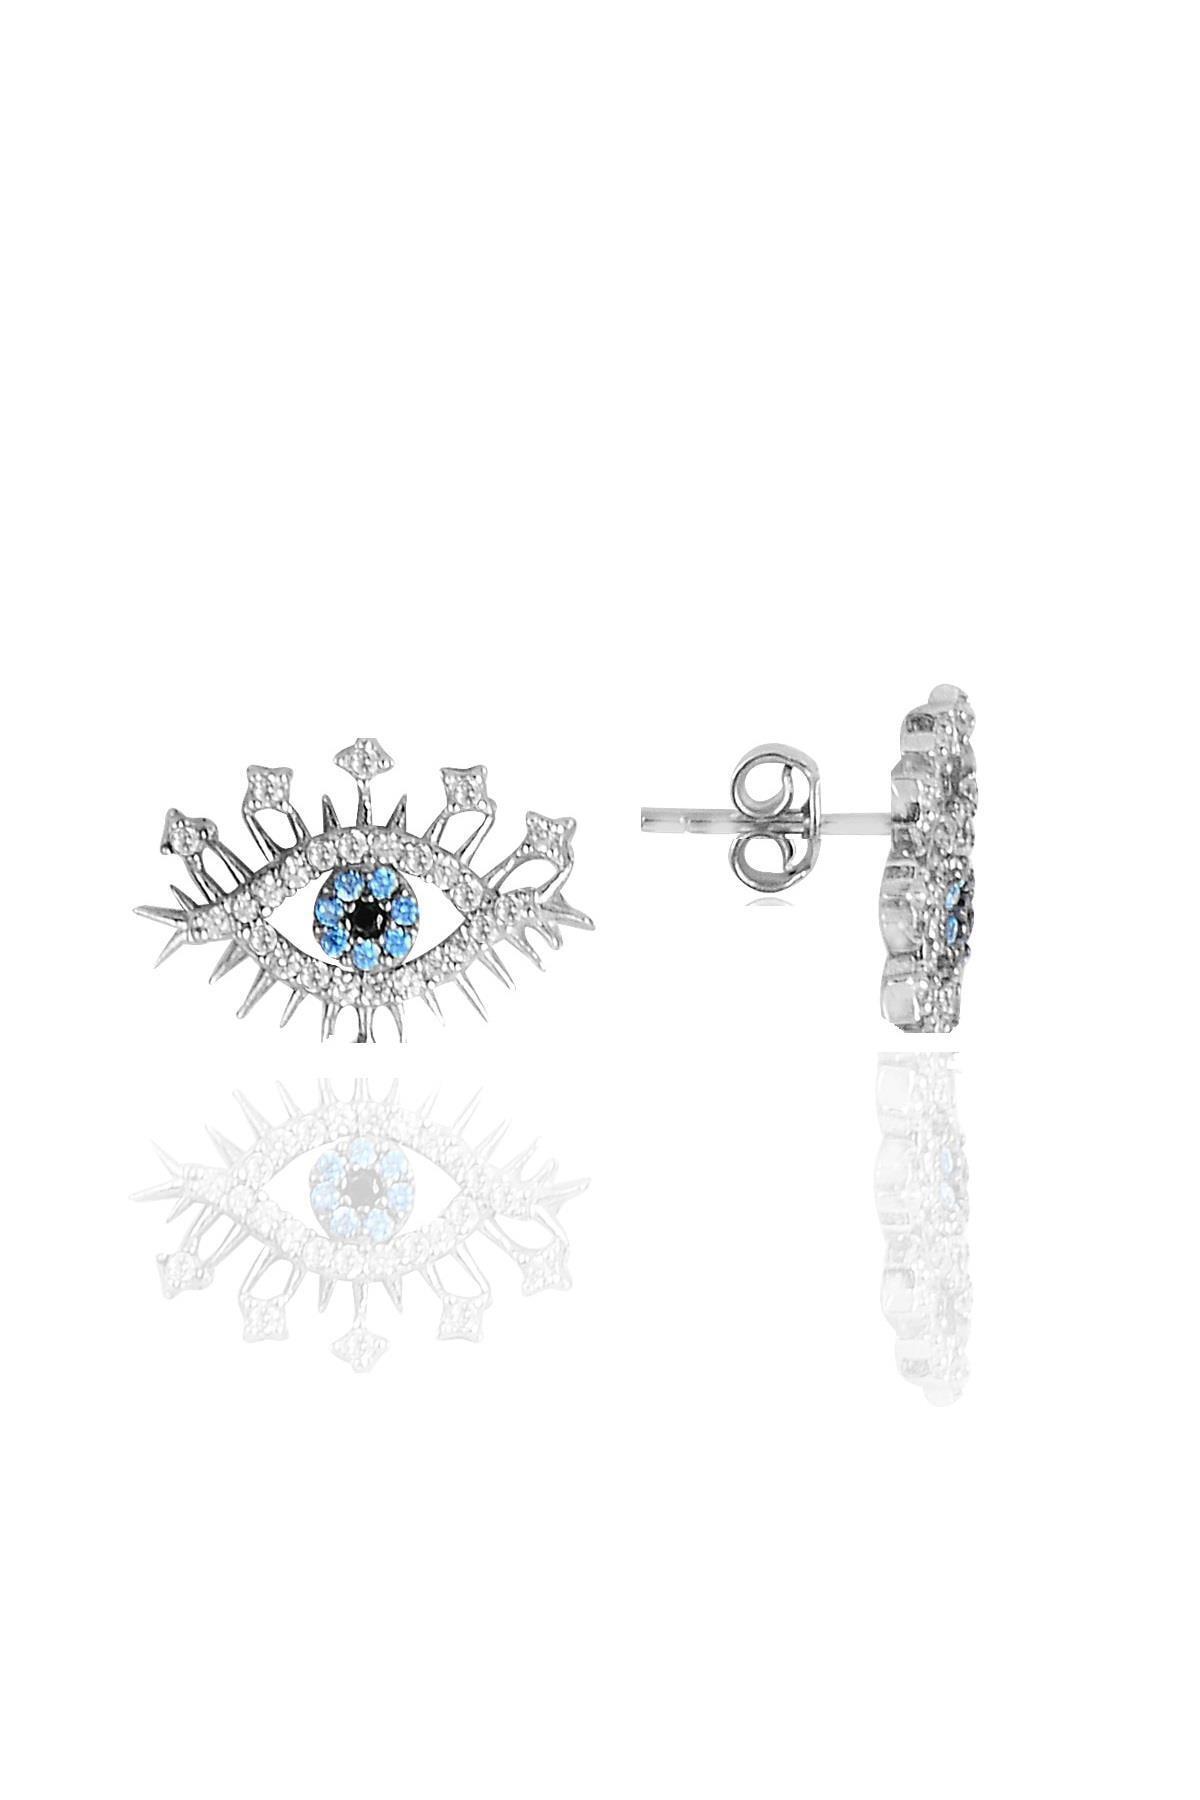 Söğütlü Silver Gümüş rodyumlu zirkon taşlı lareyn kolye küpe ve yüzük gümüş set 3